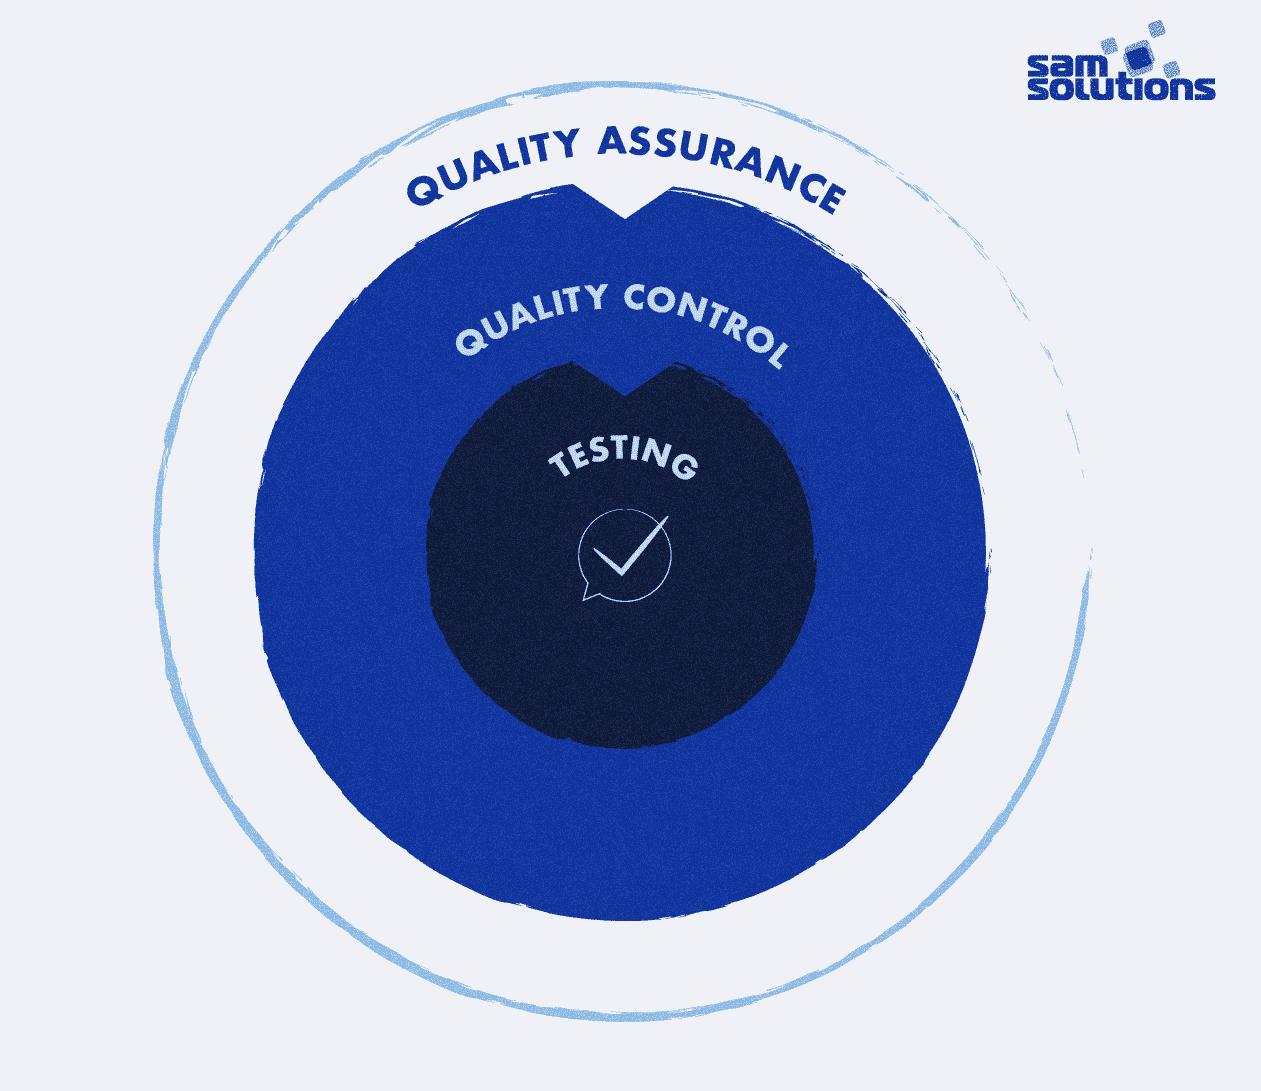 QA-QC-Testing